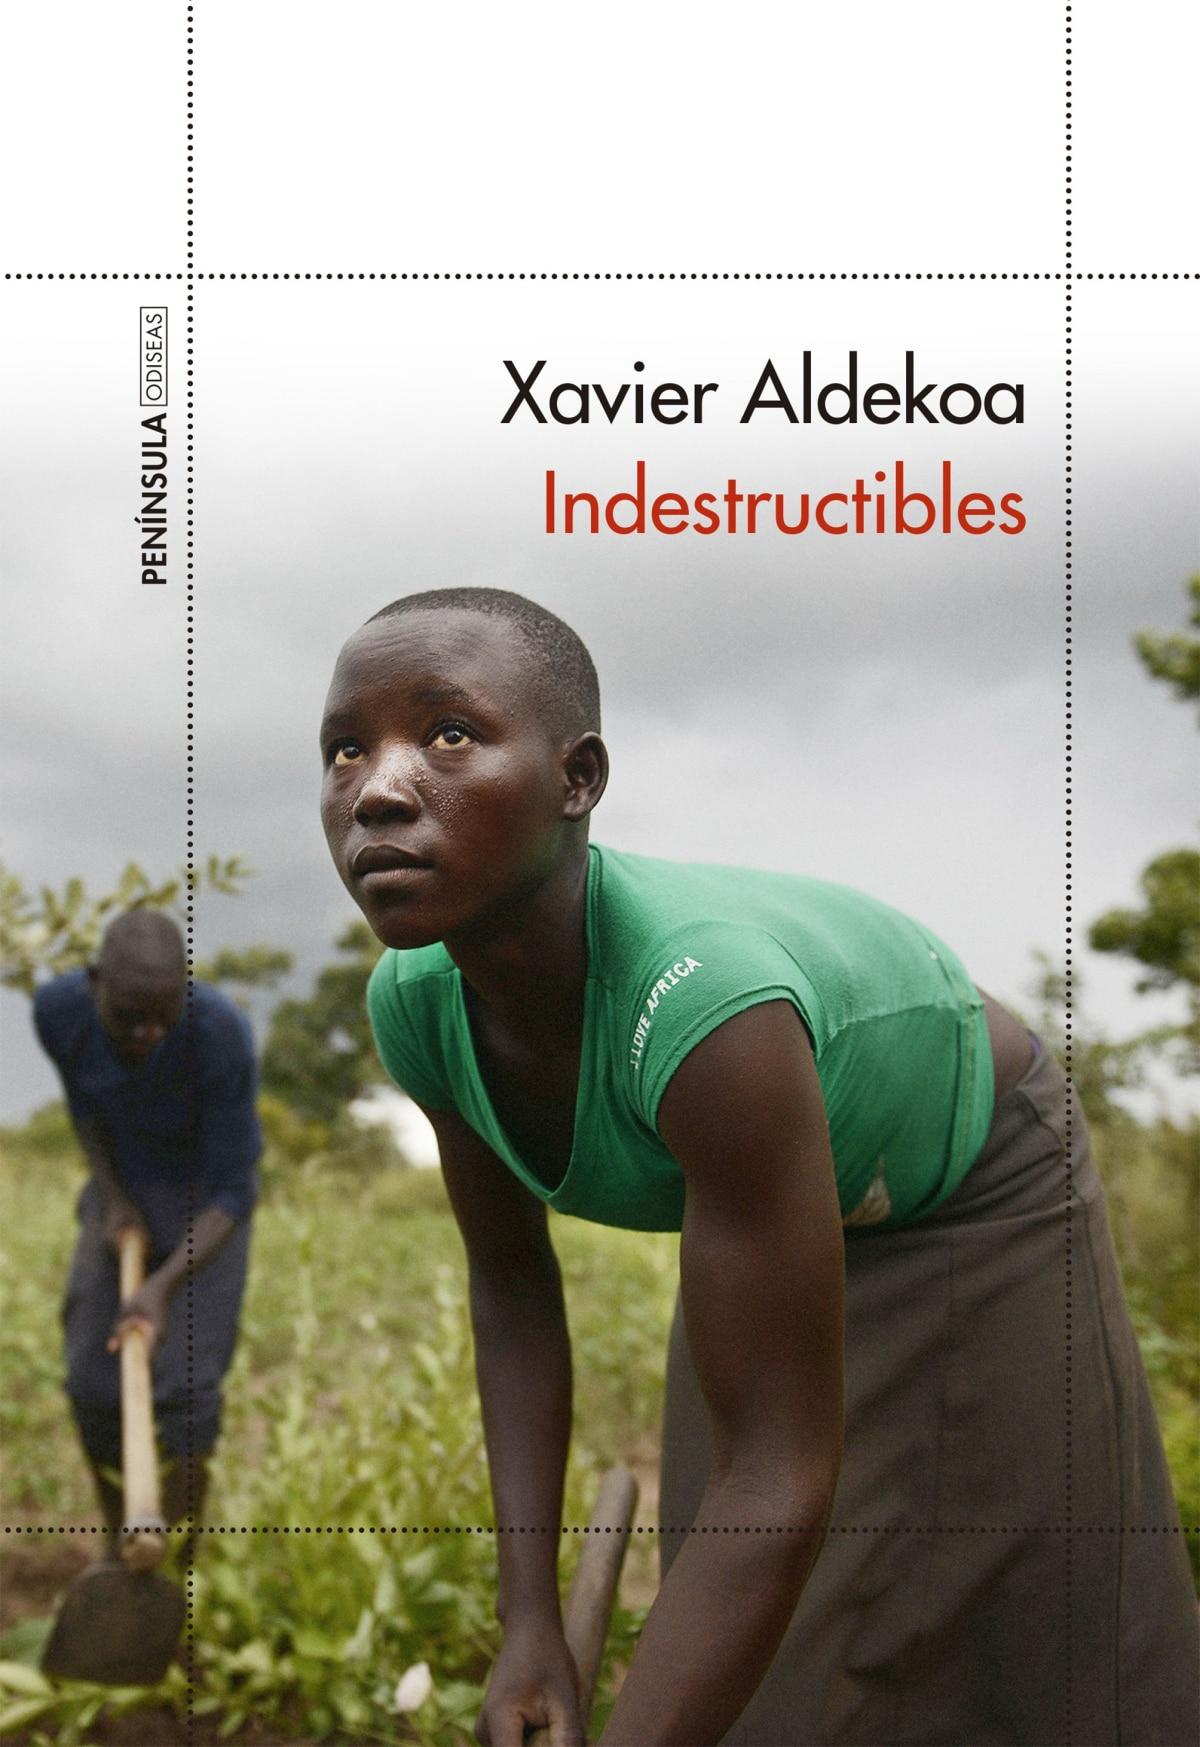 Indestructibles